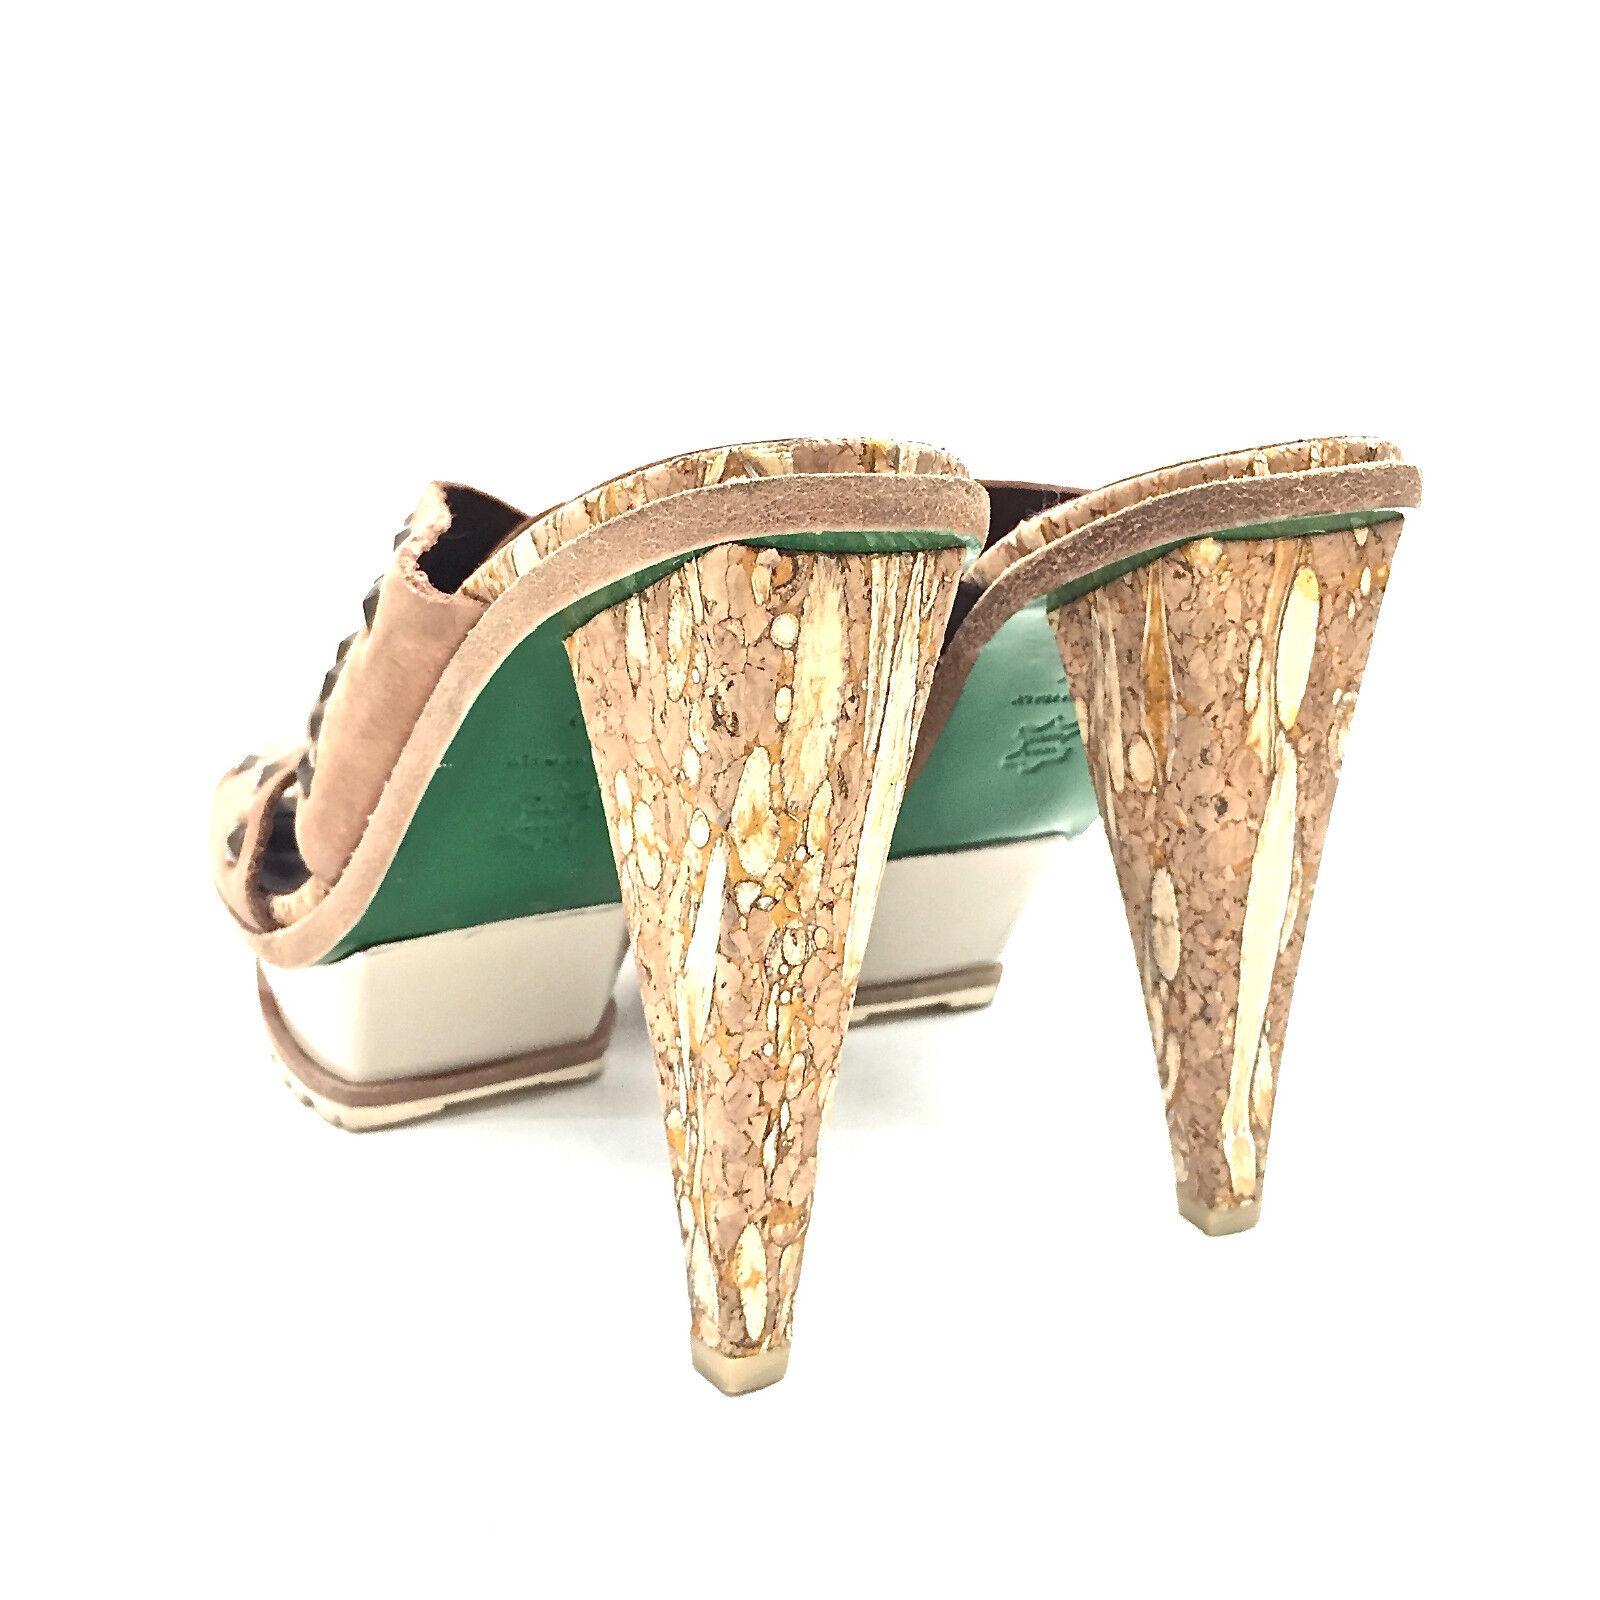 Women's Donald J. Pliner Cognac Brass Brass Brass Studded Leather & Cork Platforms Size 6.5 4fc42b